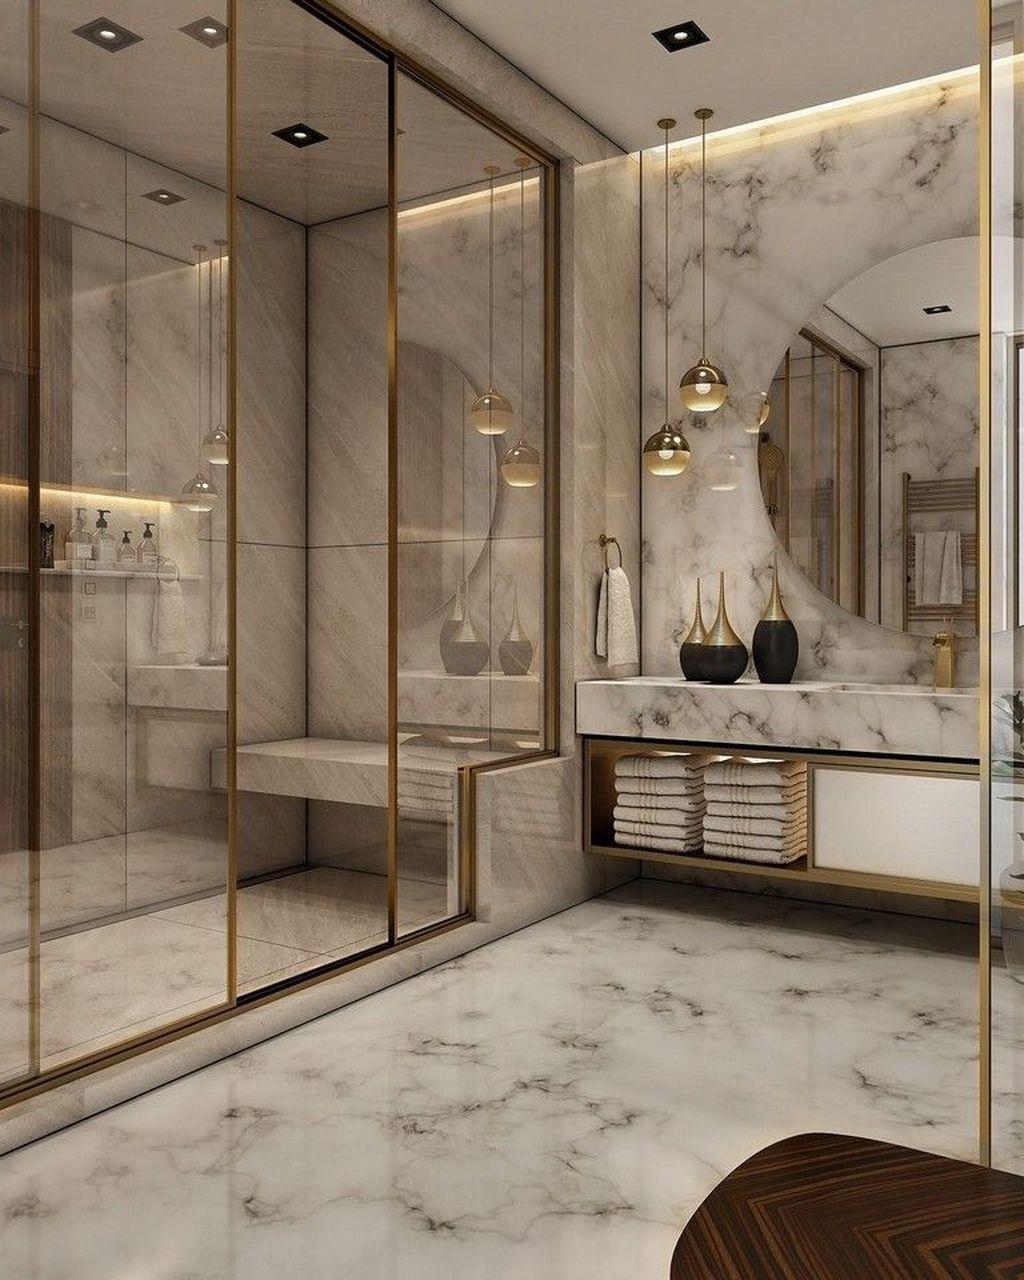 33 Admirable Luxury Bathroom Design